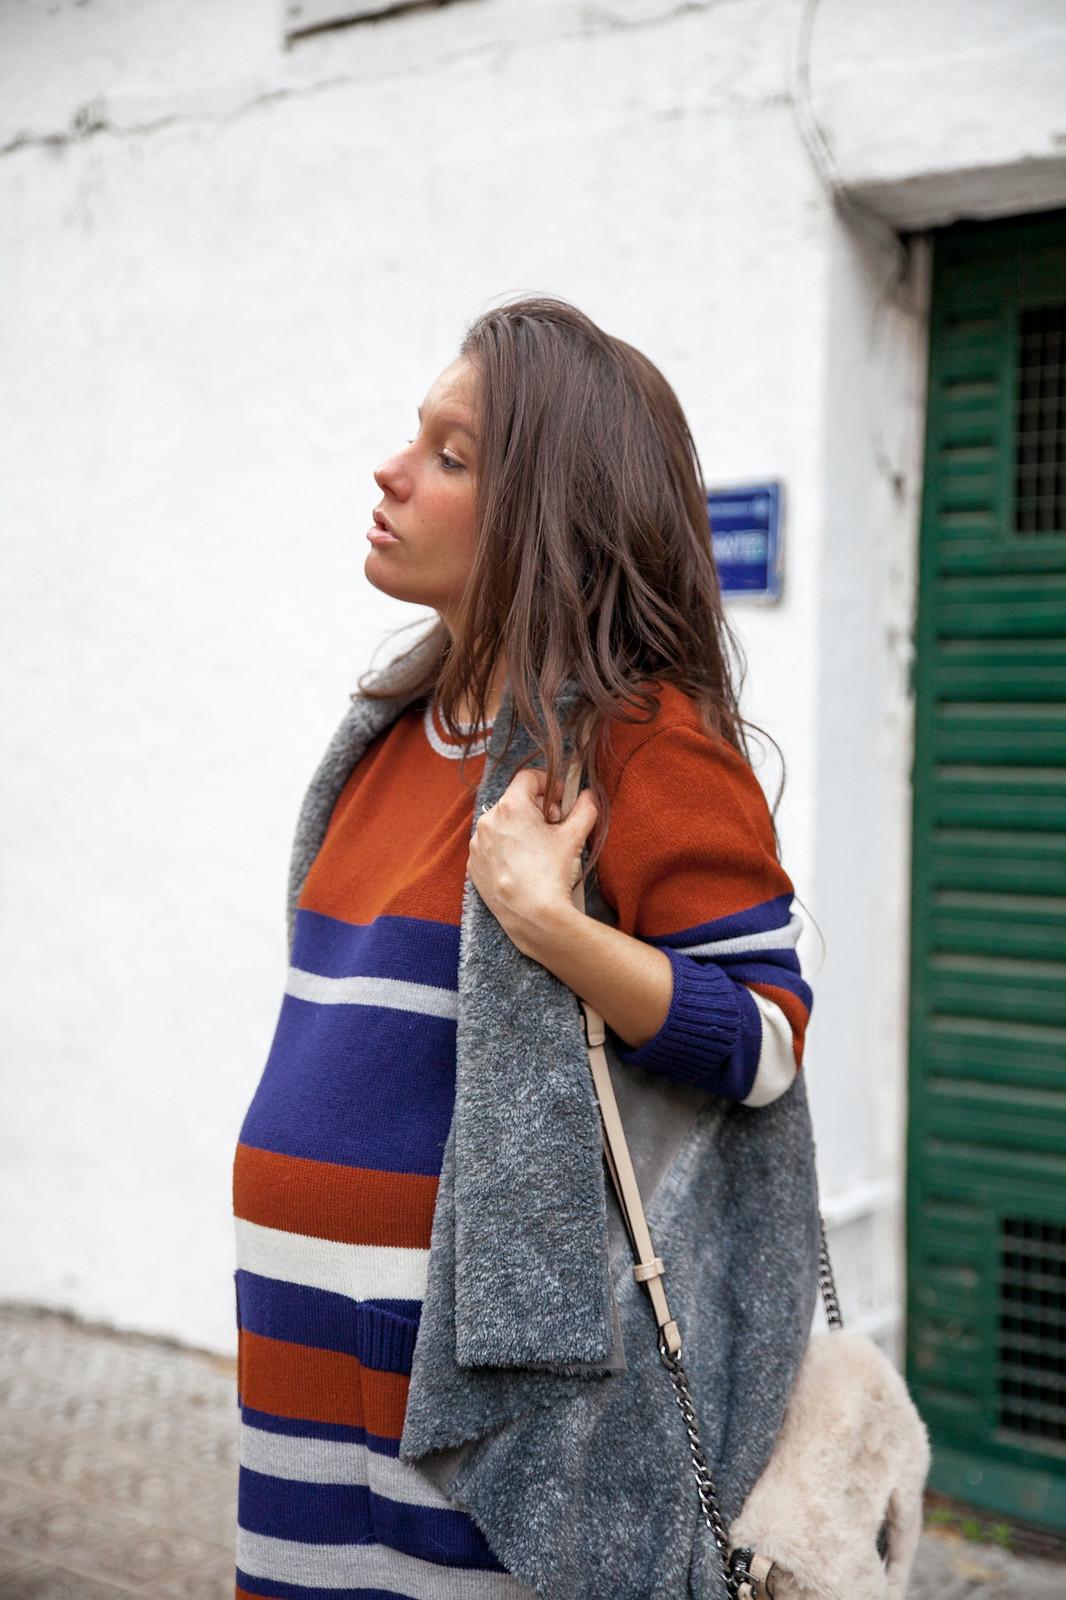 08_como_combinar_Vestido_rayas_punto_chaleco_look_embarazo_tercer_trimestre_theguestgirl_fashion_influencer_fashion_portugal_brand_ruga